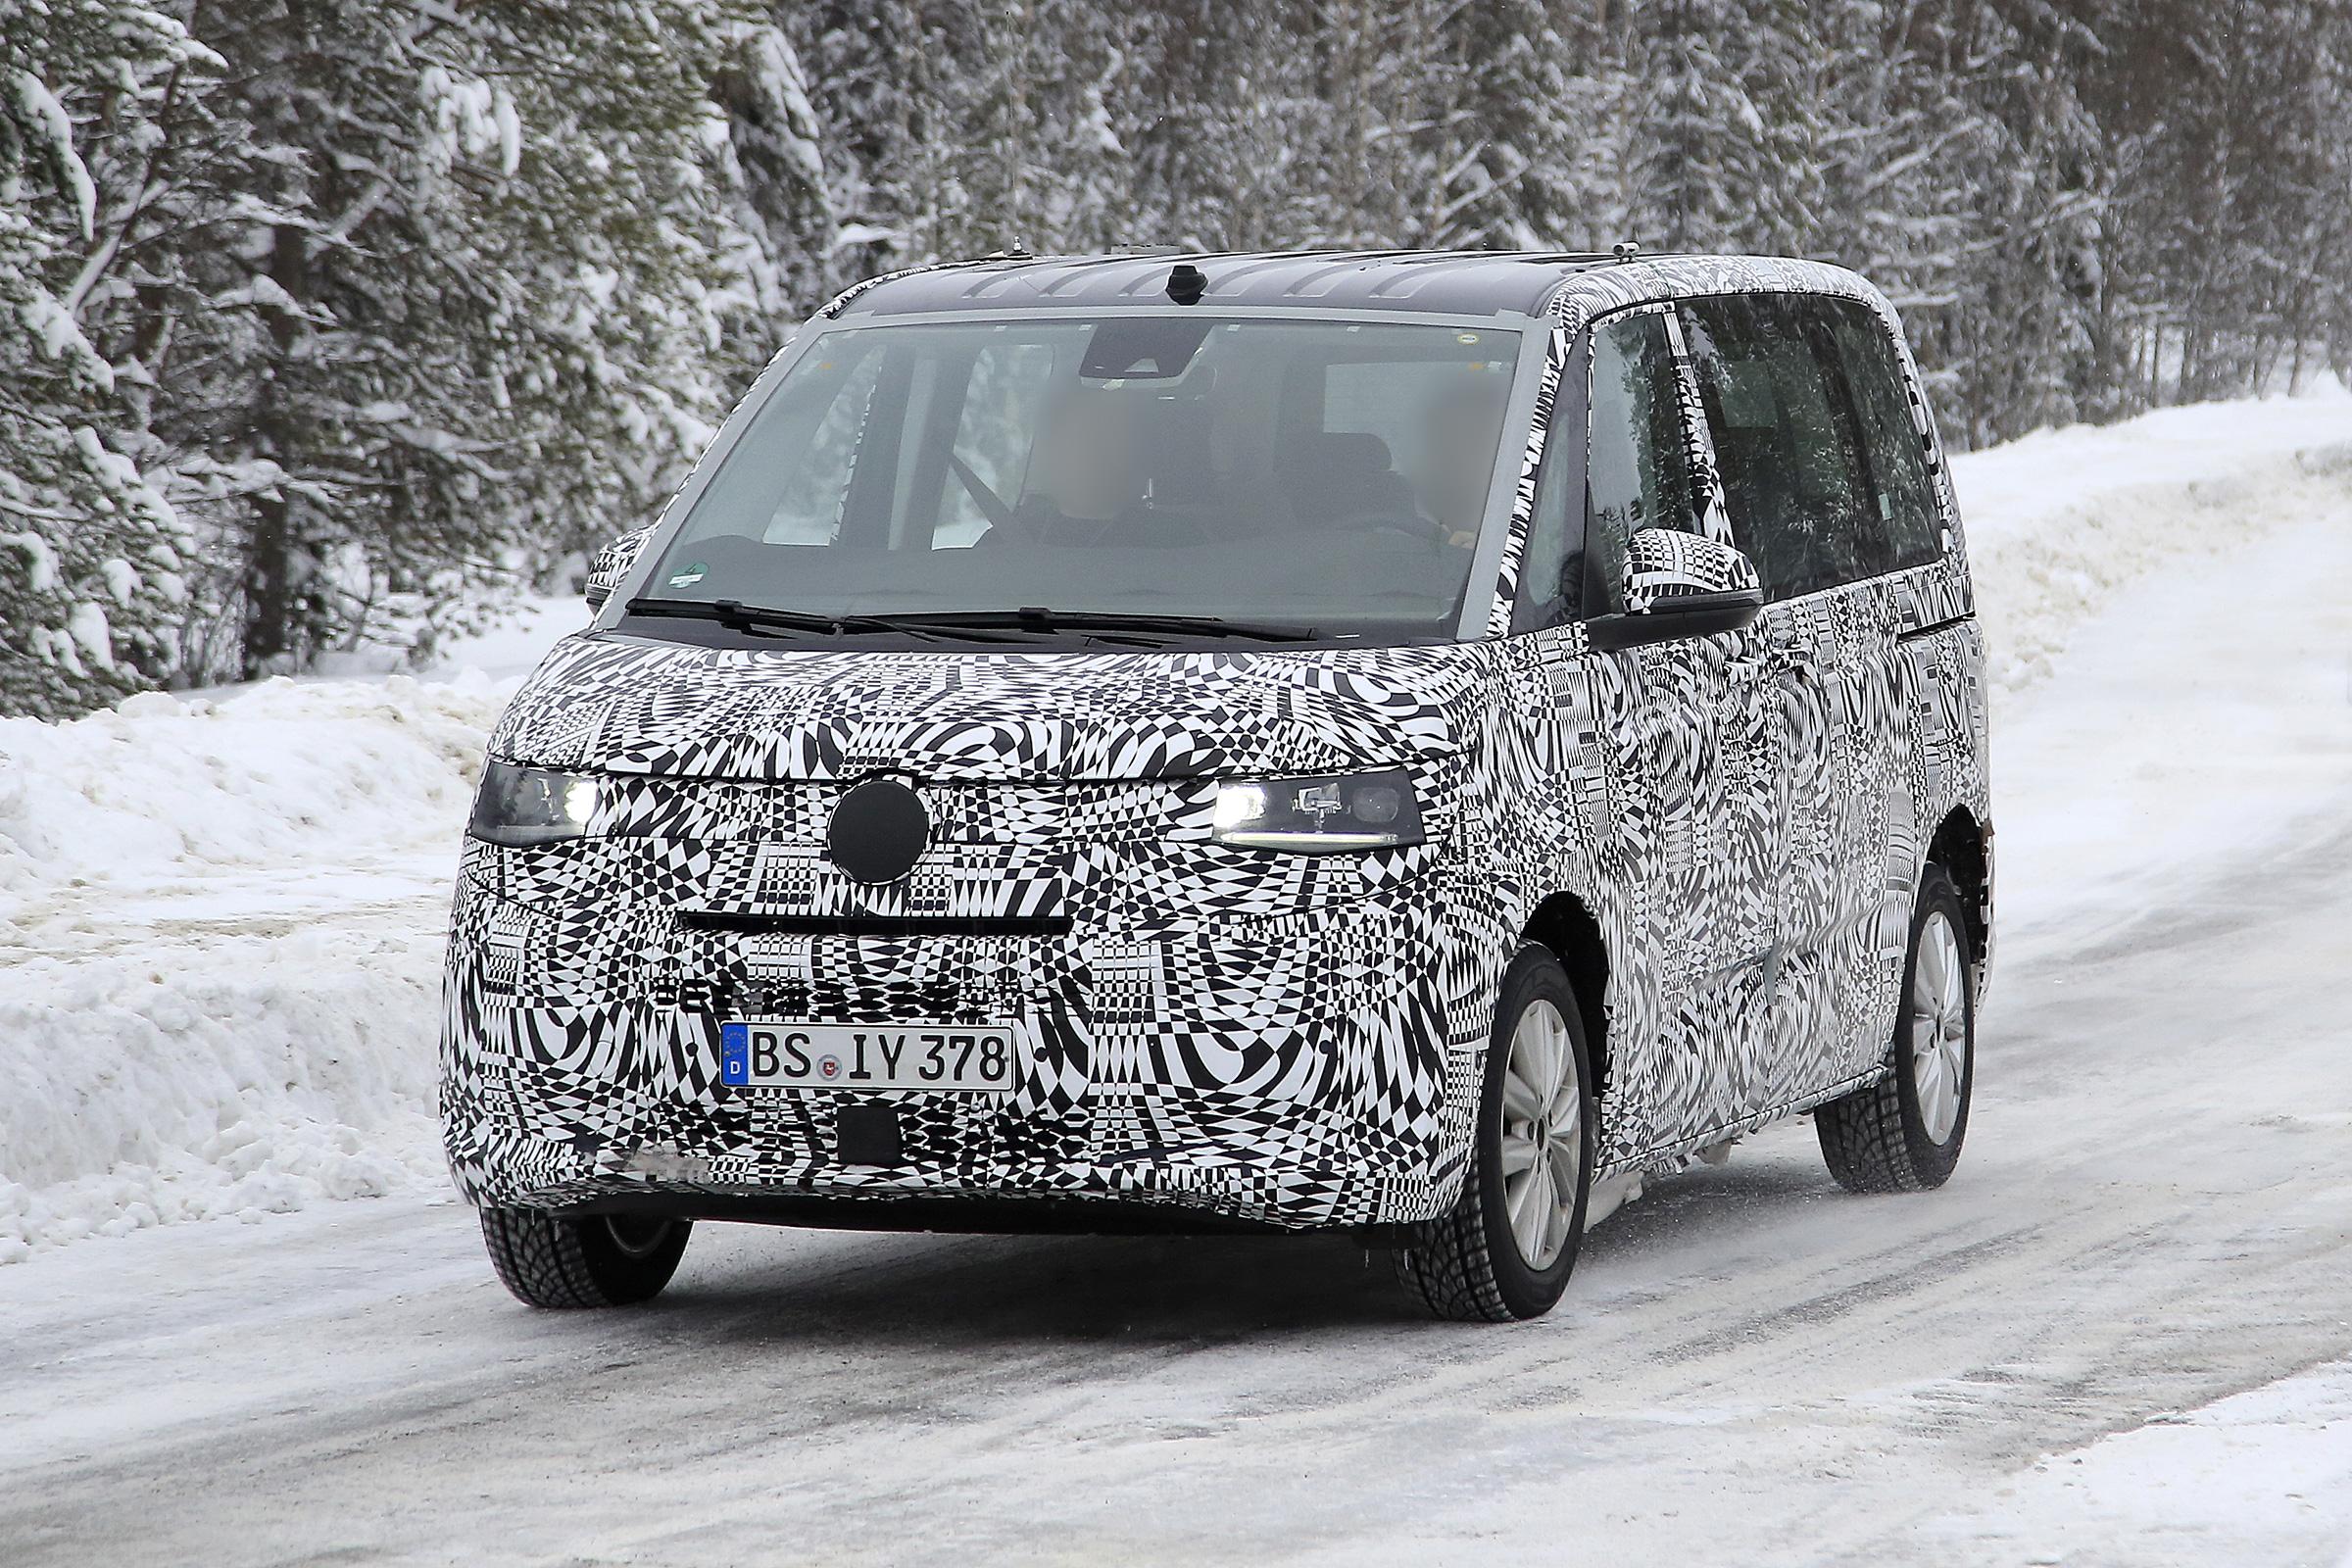 New 2021 Volkswagen Transporter T7 caught on camera | Auto ...